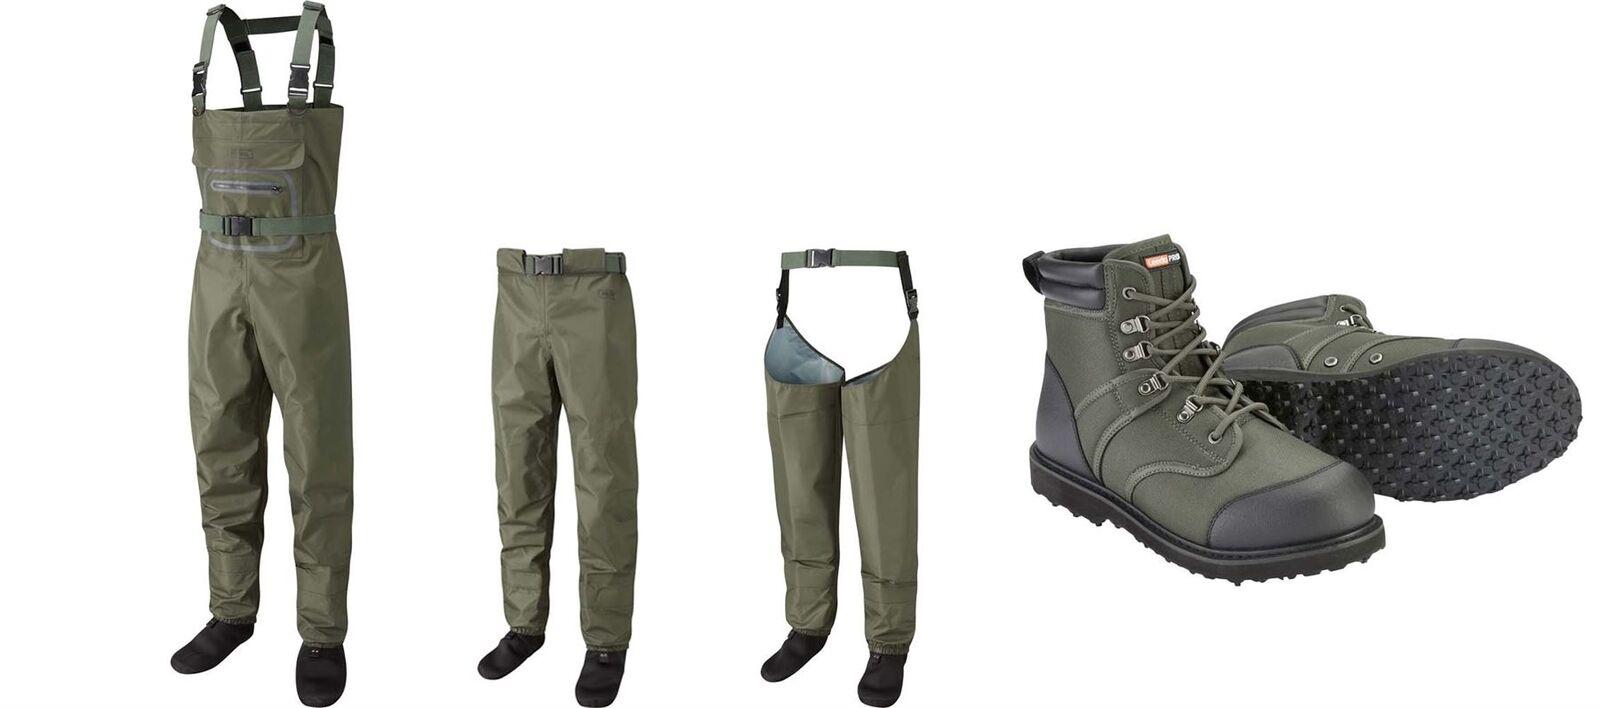 Leeda Profil Breathable Waders & Boots   Fishing